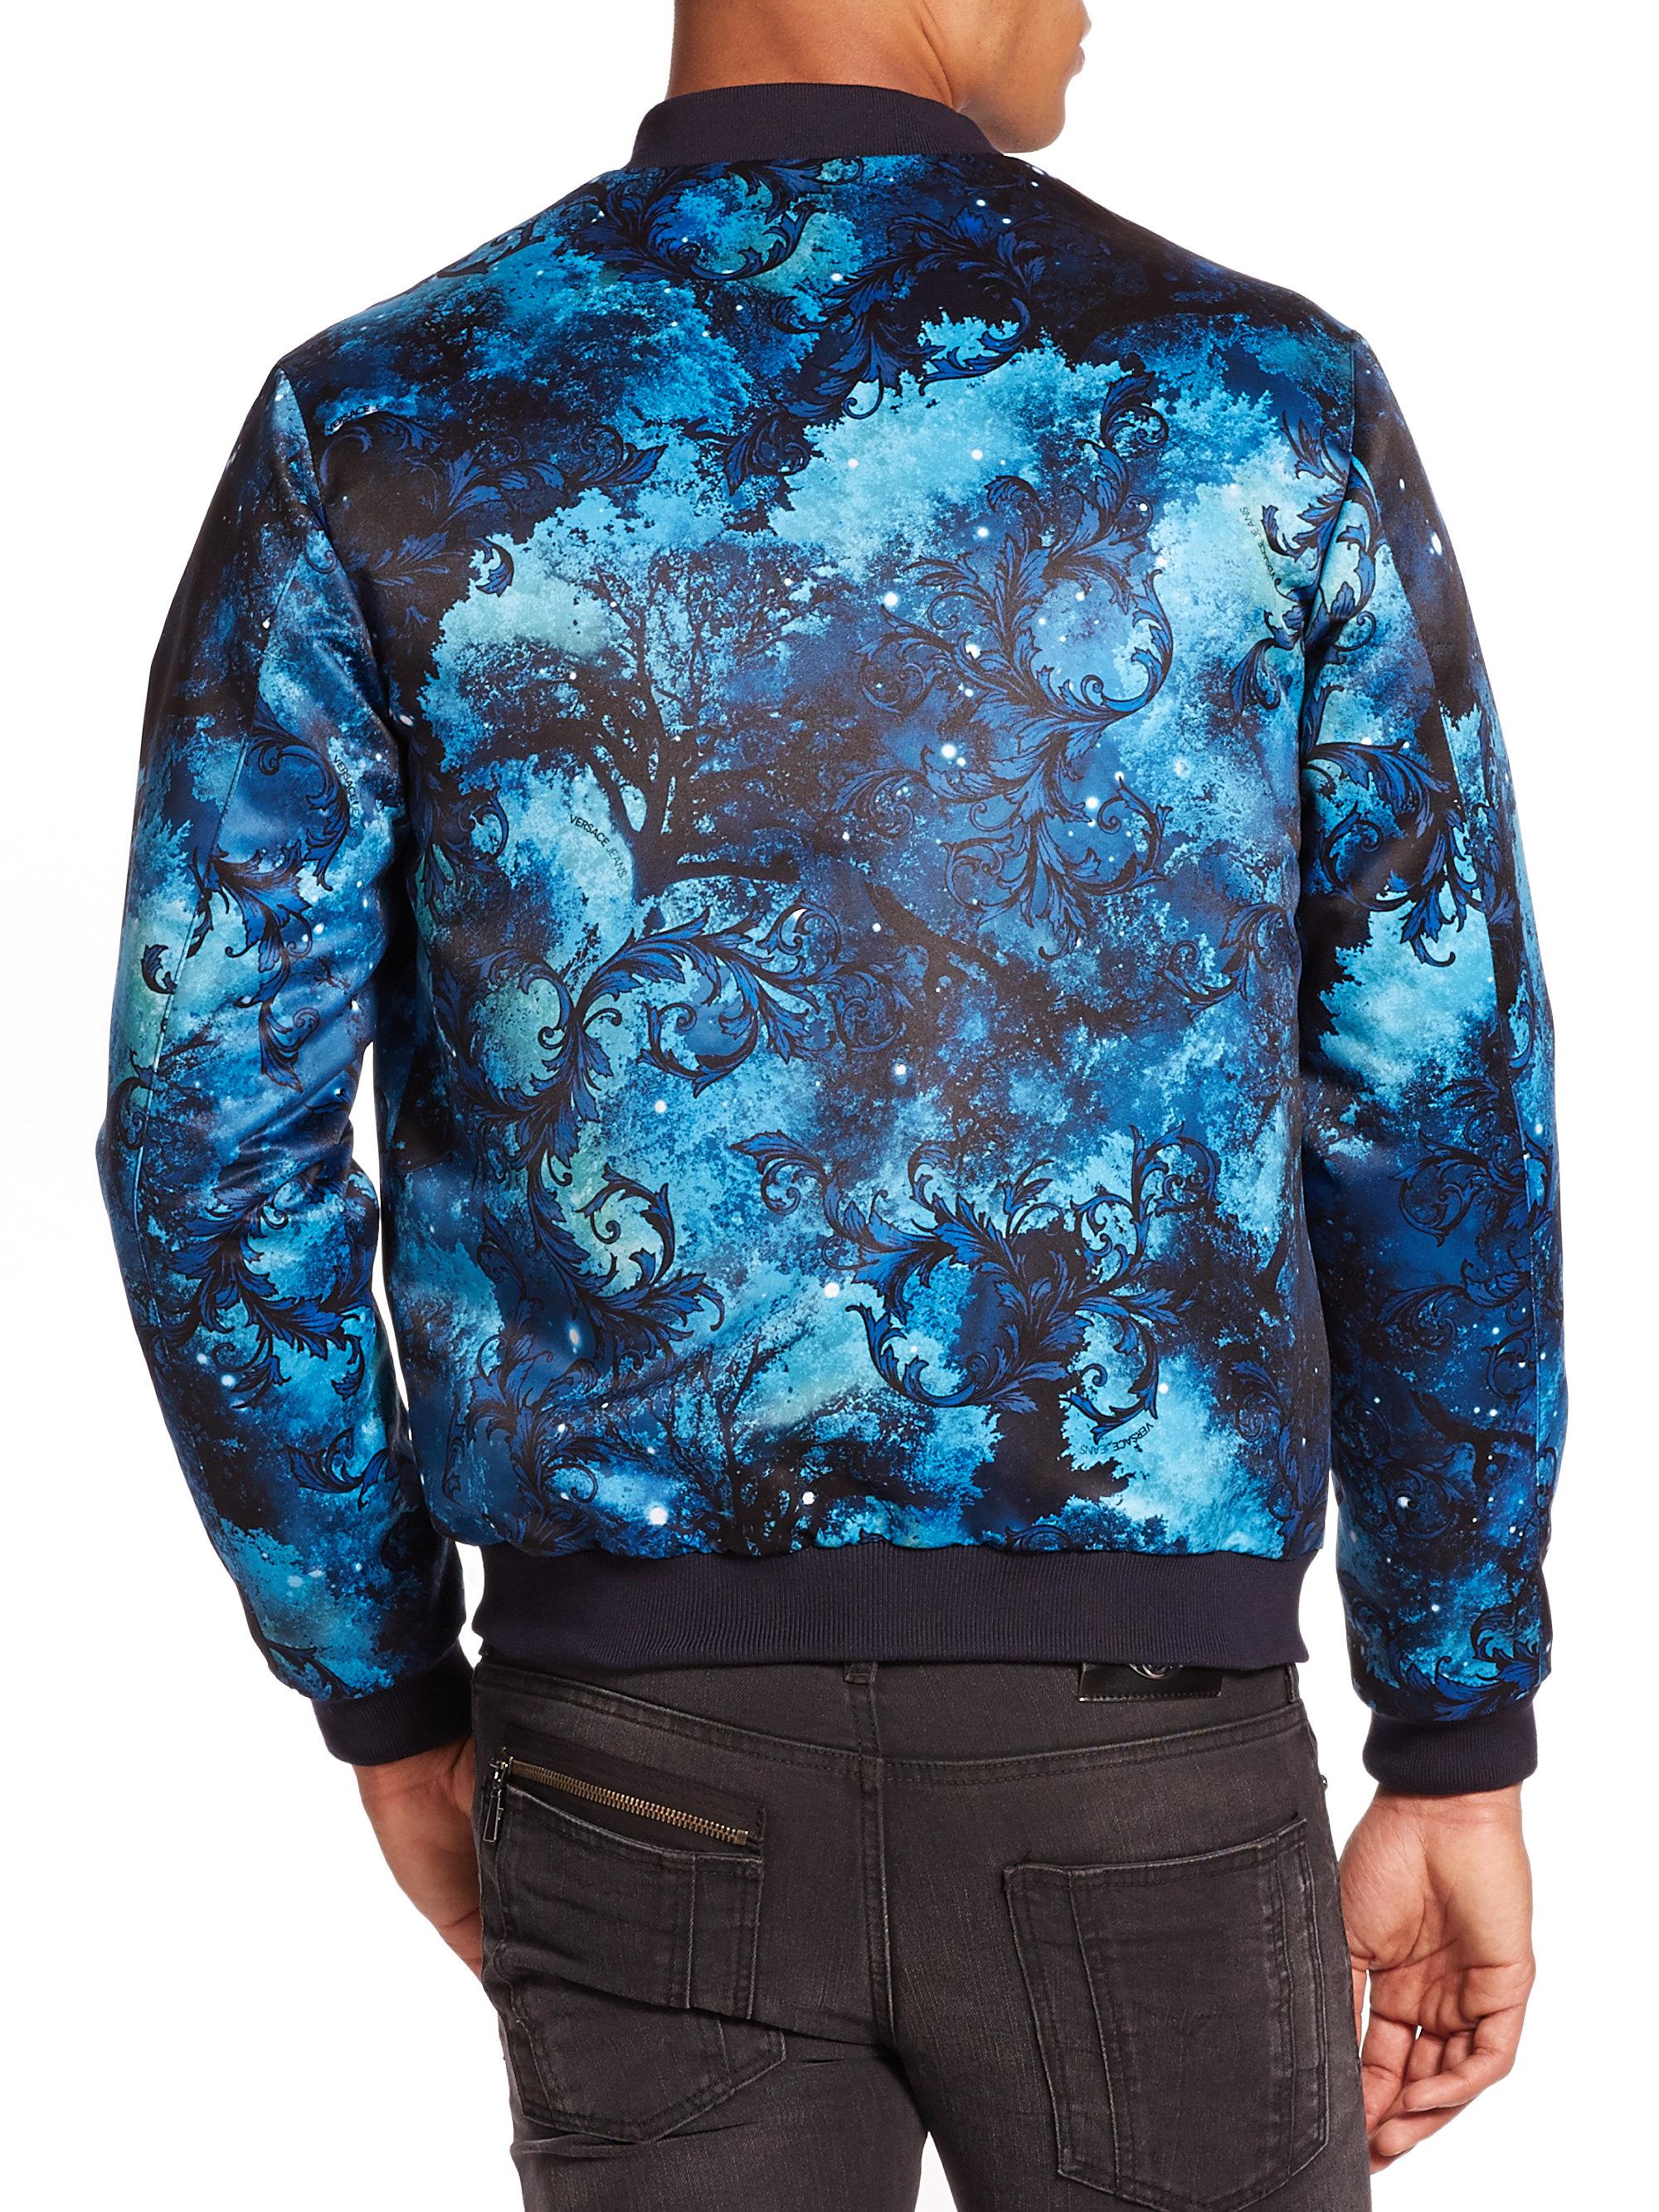 Versace Jeans Celestial Print Jacket In Blue For Men Lyst